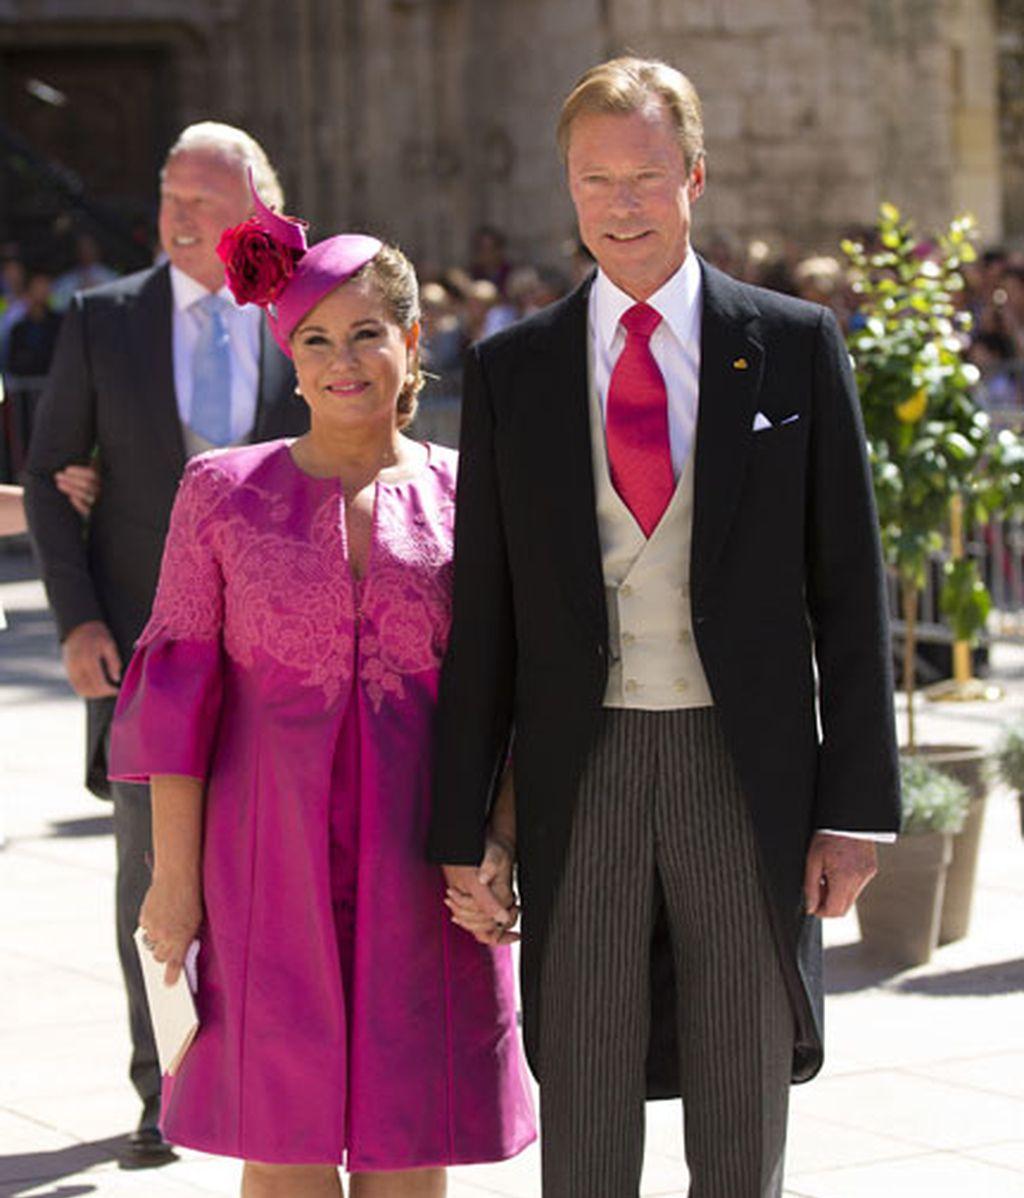 La Gran Duquesa de Luxemburgo, Maria Teresa, y el Gran Duque, Henri